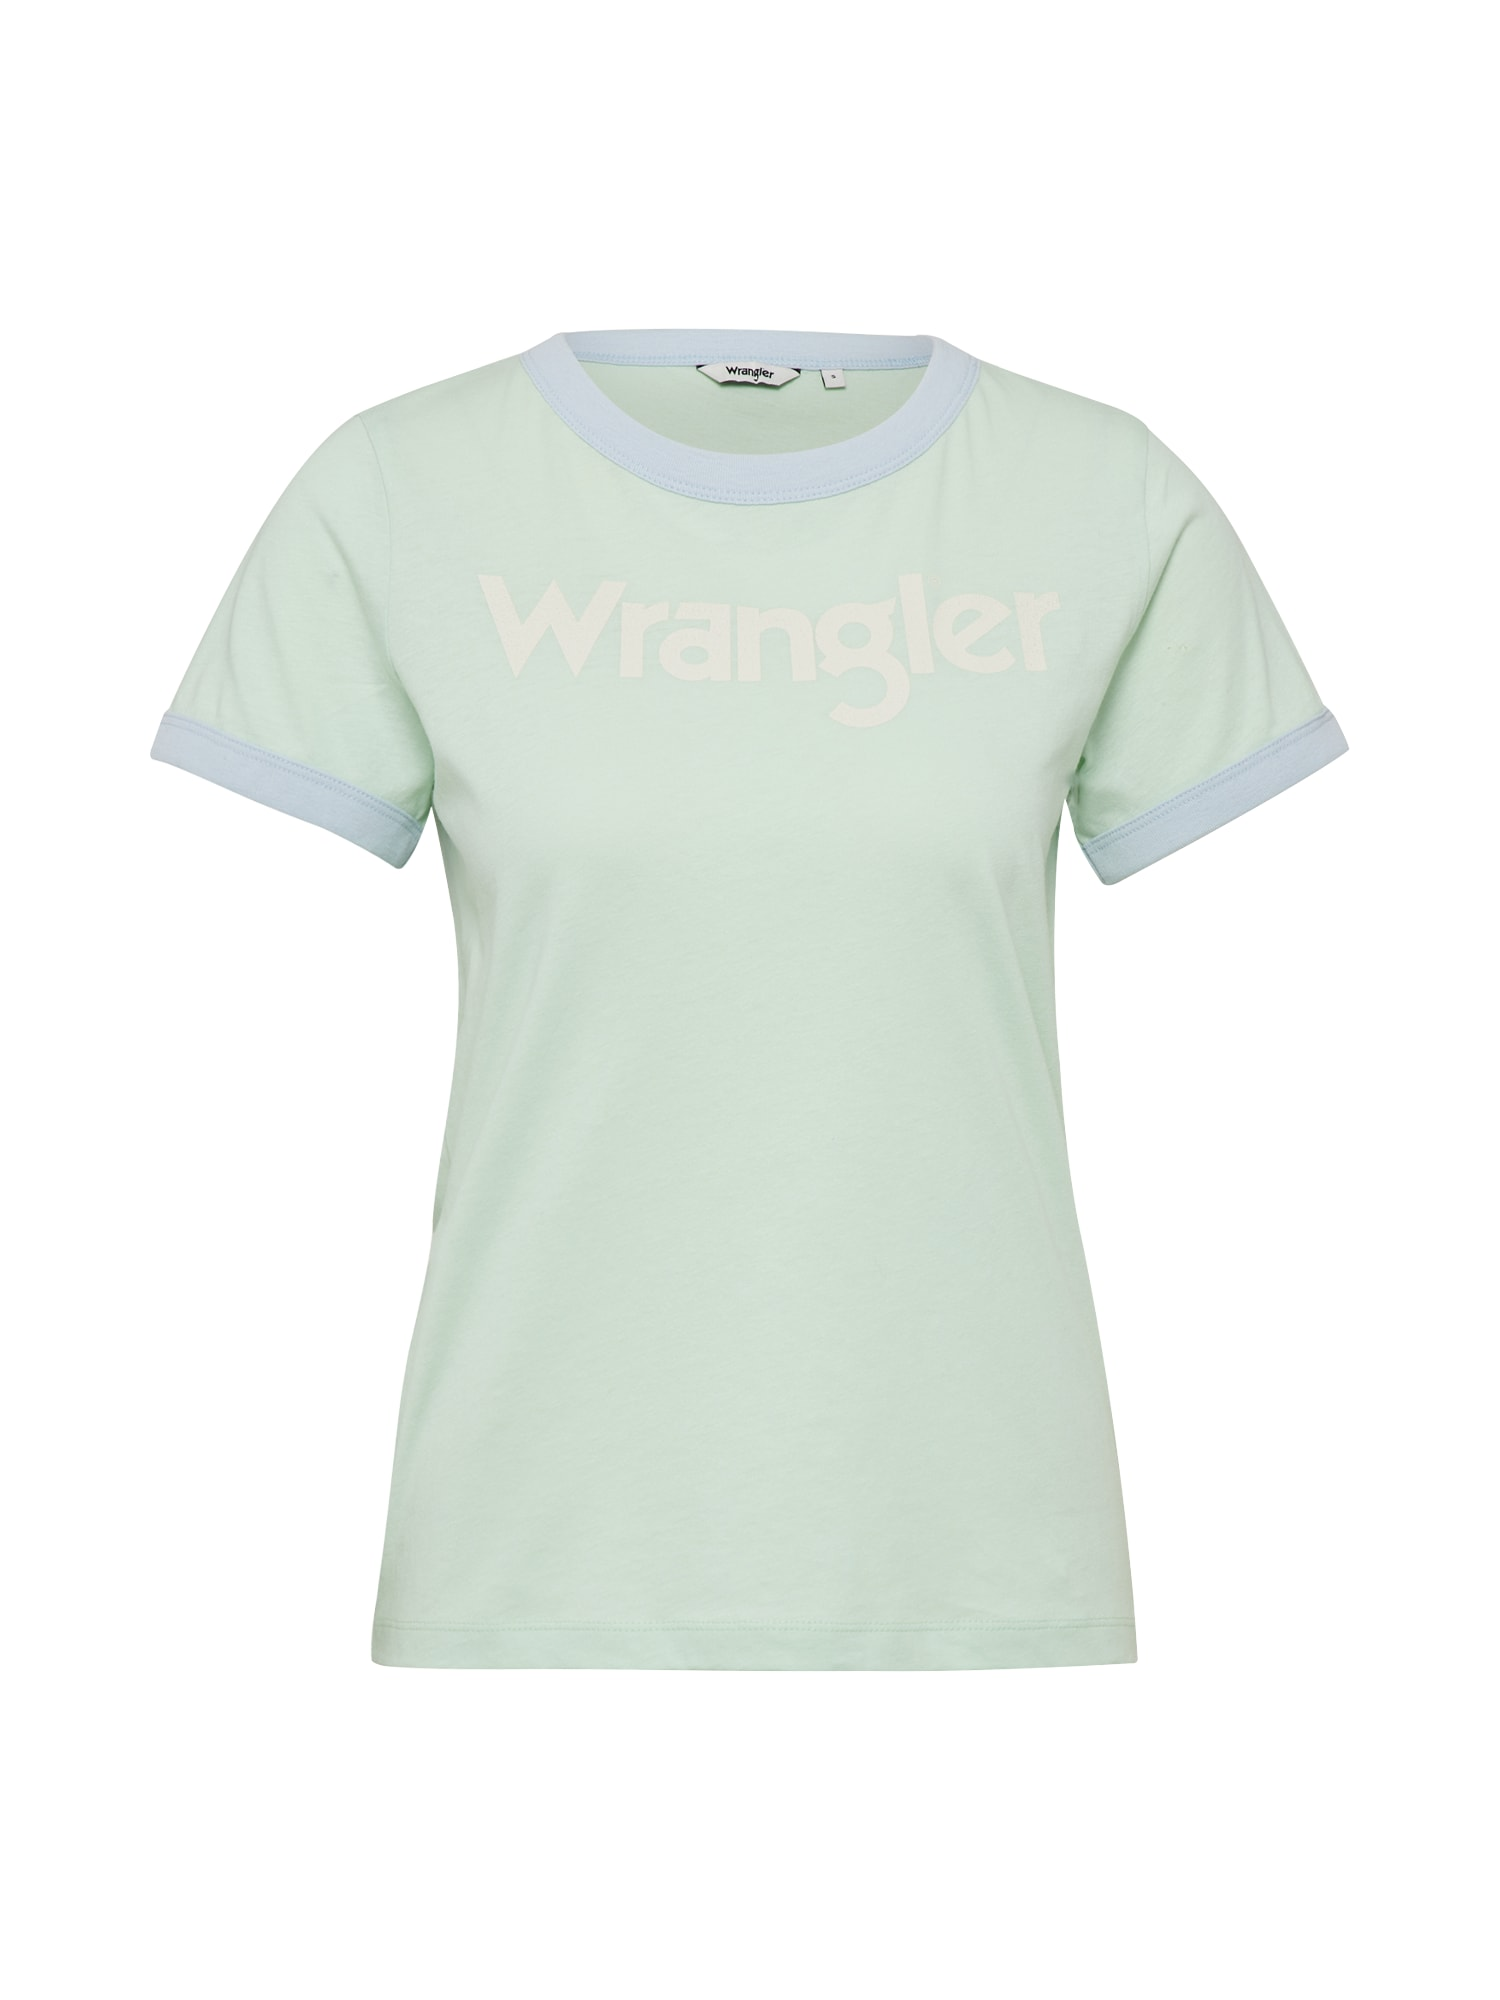 WRANGLER Dames Shirt RETRO KABEL groen